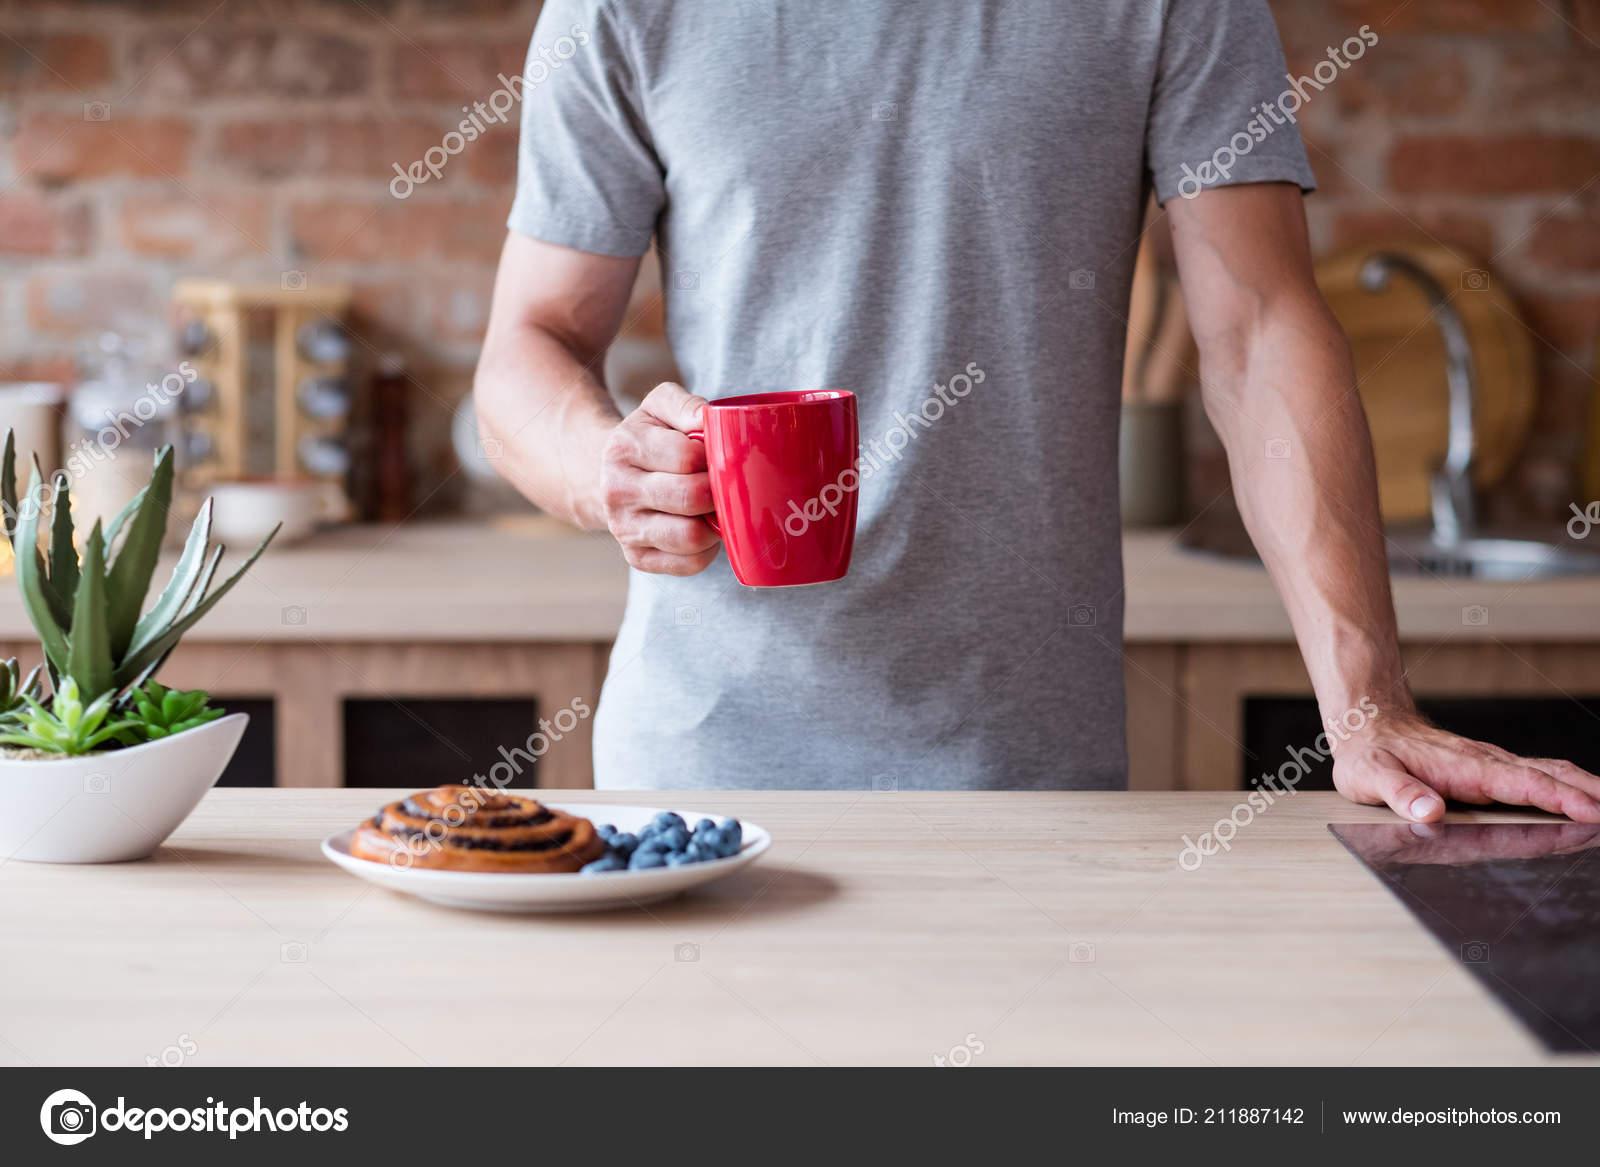 Morning Food Bad Breakfast Habit Man Red Mug Stock Photo